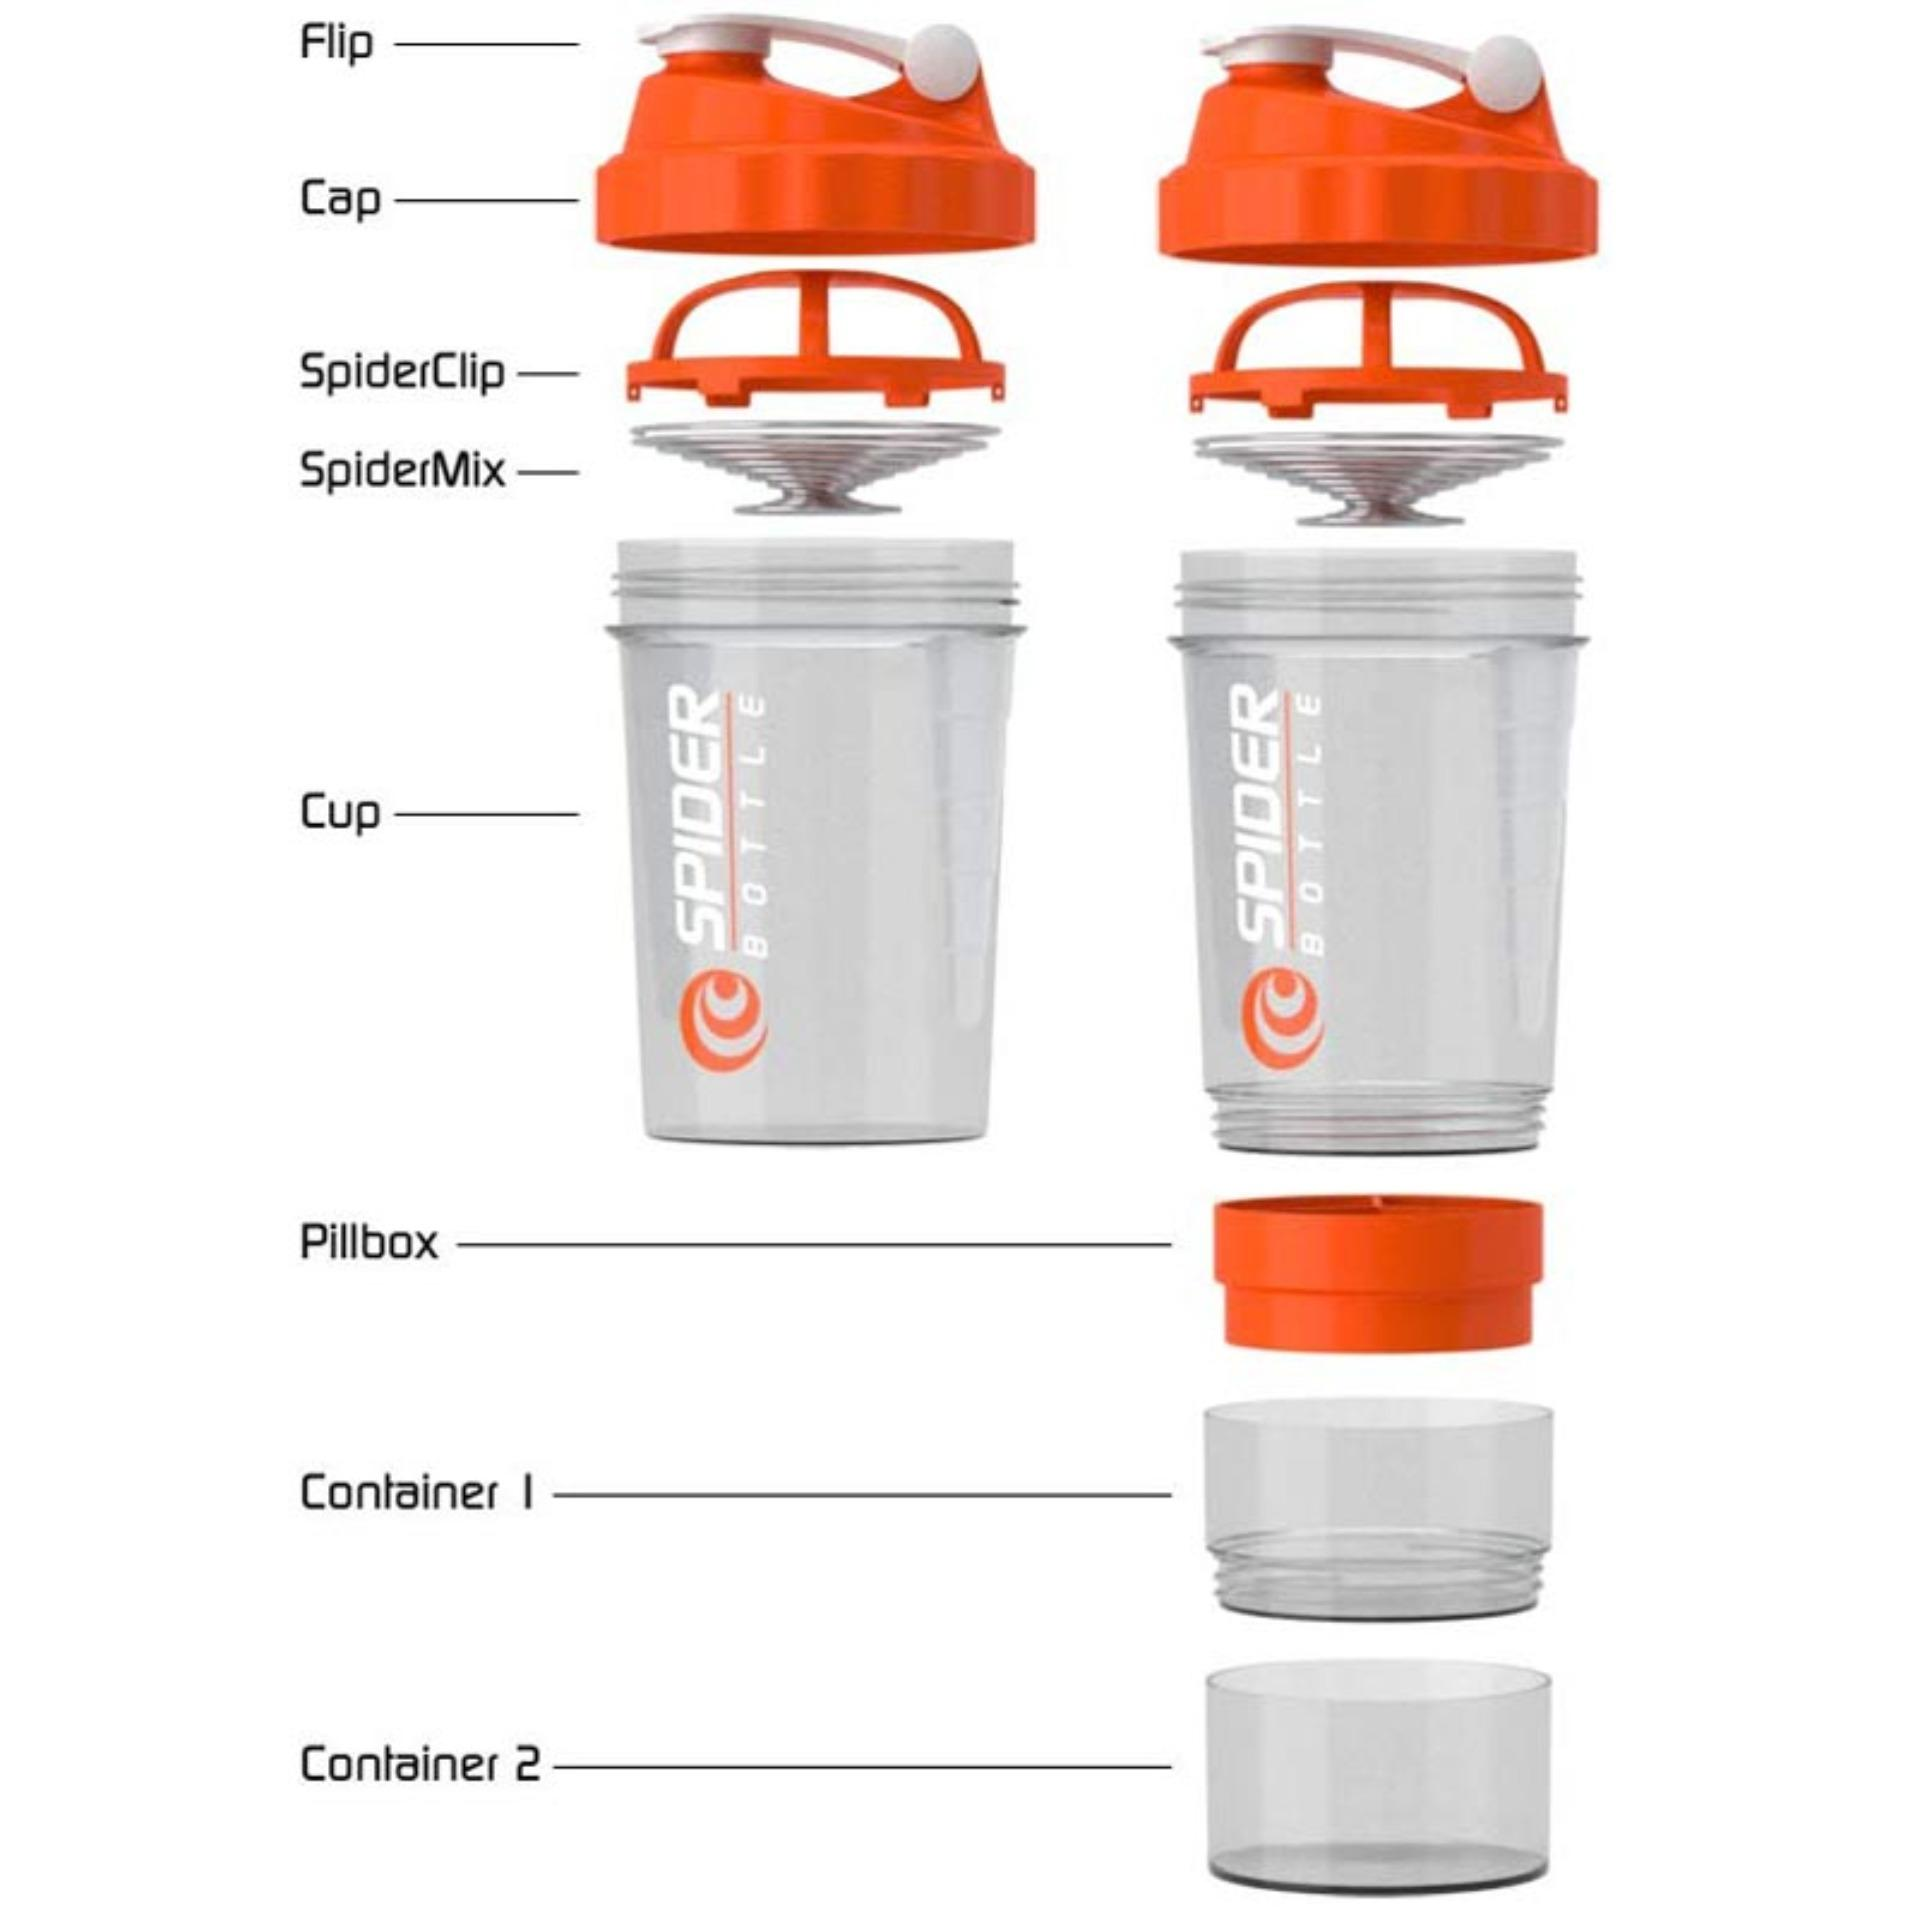 OHOME Botol Minum Fitness Spider Bottle 600 ML Smart Shaker Gym Water Bottle Air - Ungu | Lazada Indonesia